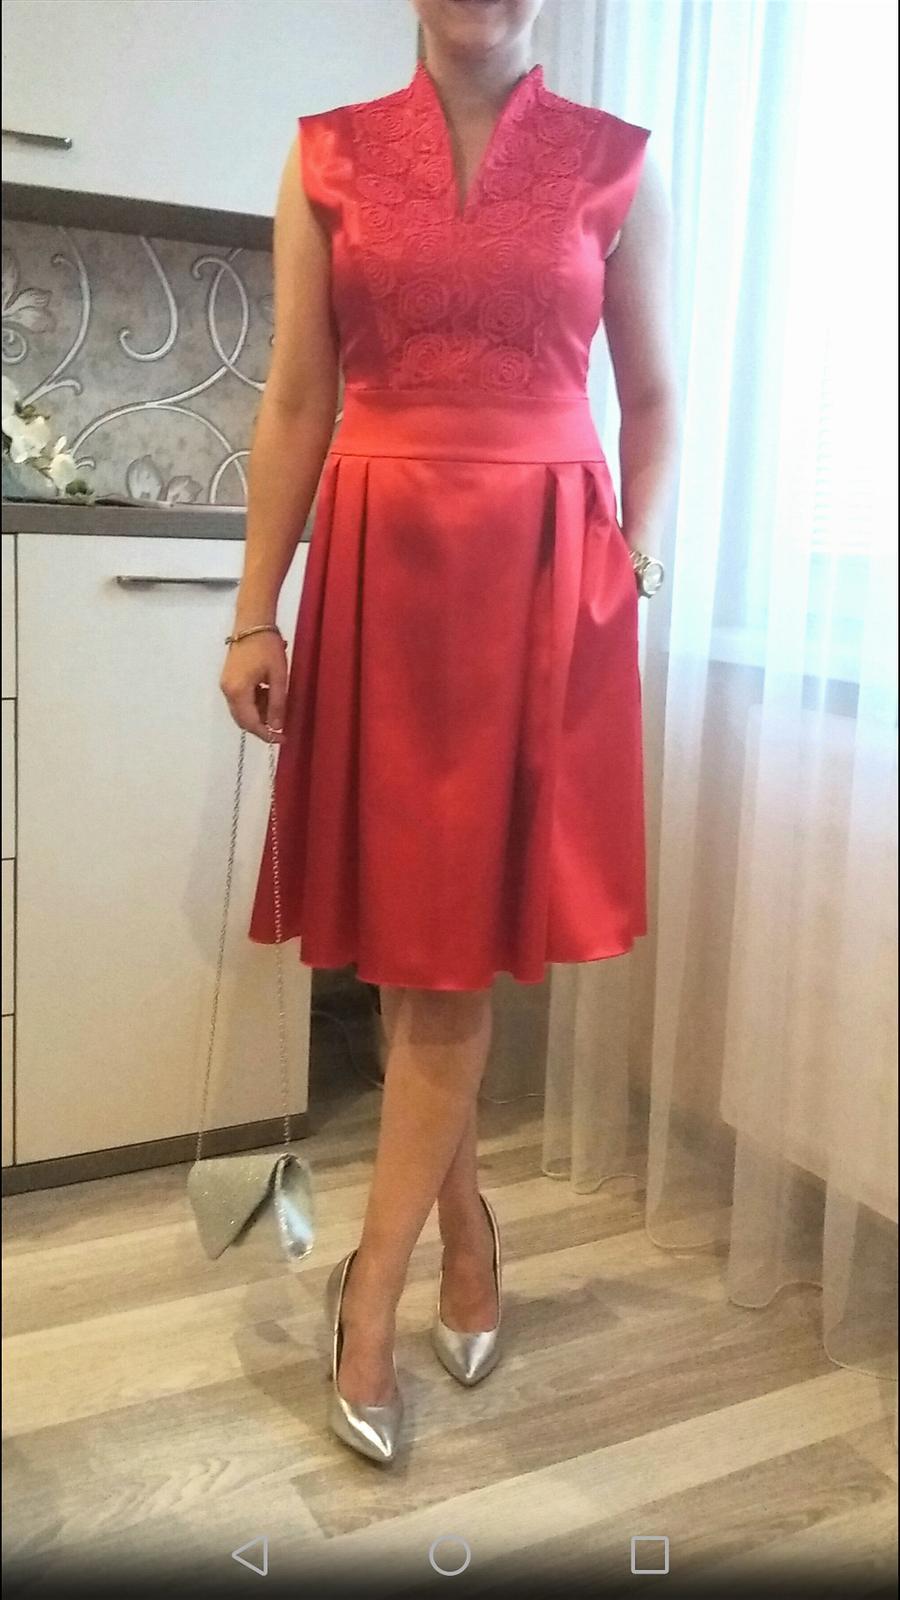 Luxusné červené saténové šaty a095a1a8b9e